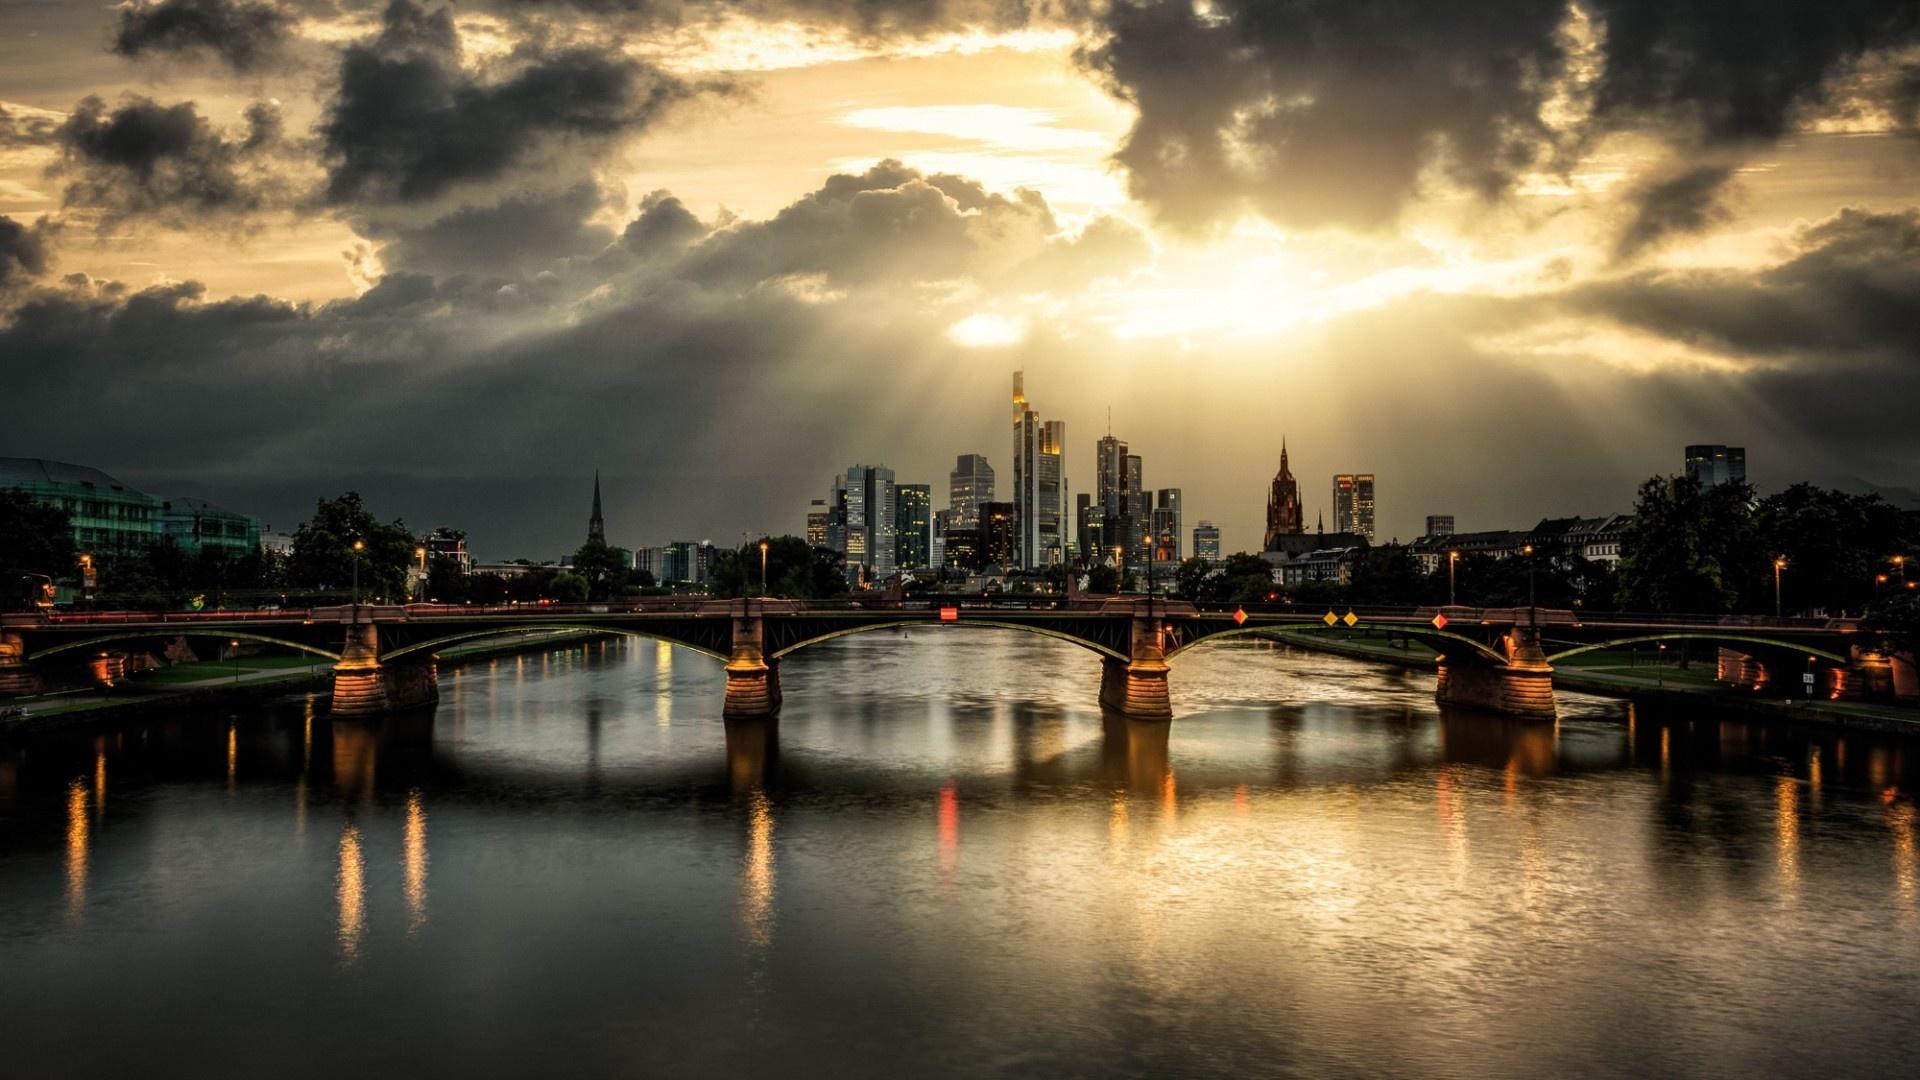 Skyscraper Wallpaper Hd City Bridge Clouds Rays River Wallpapers 1920x1080 513691